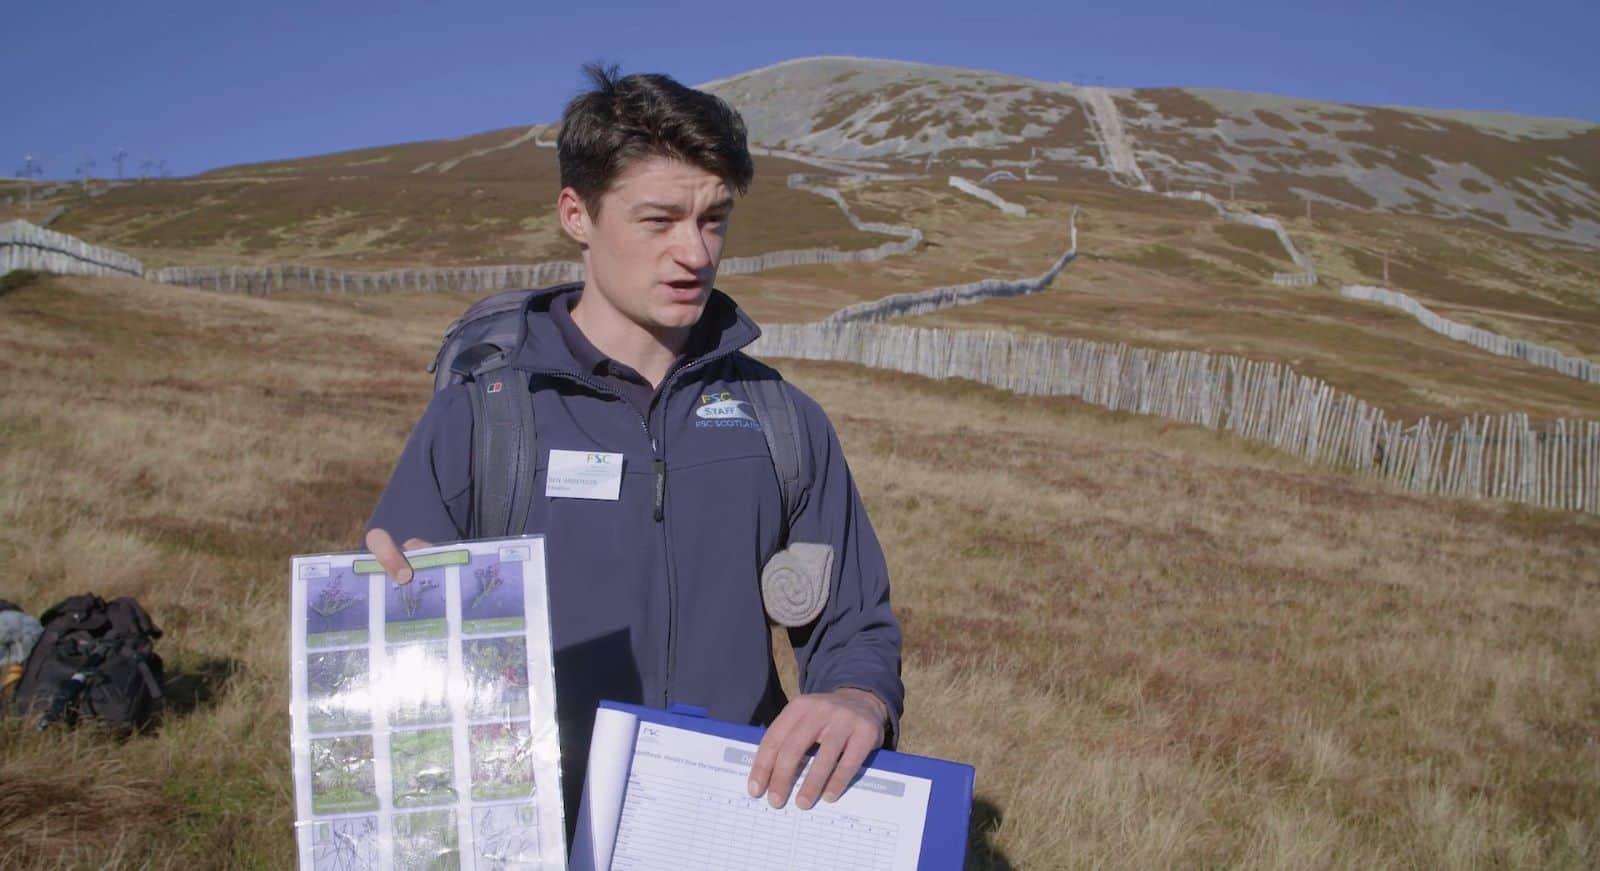 Tutor teaching fieldwork